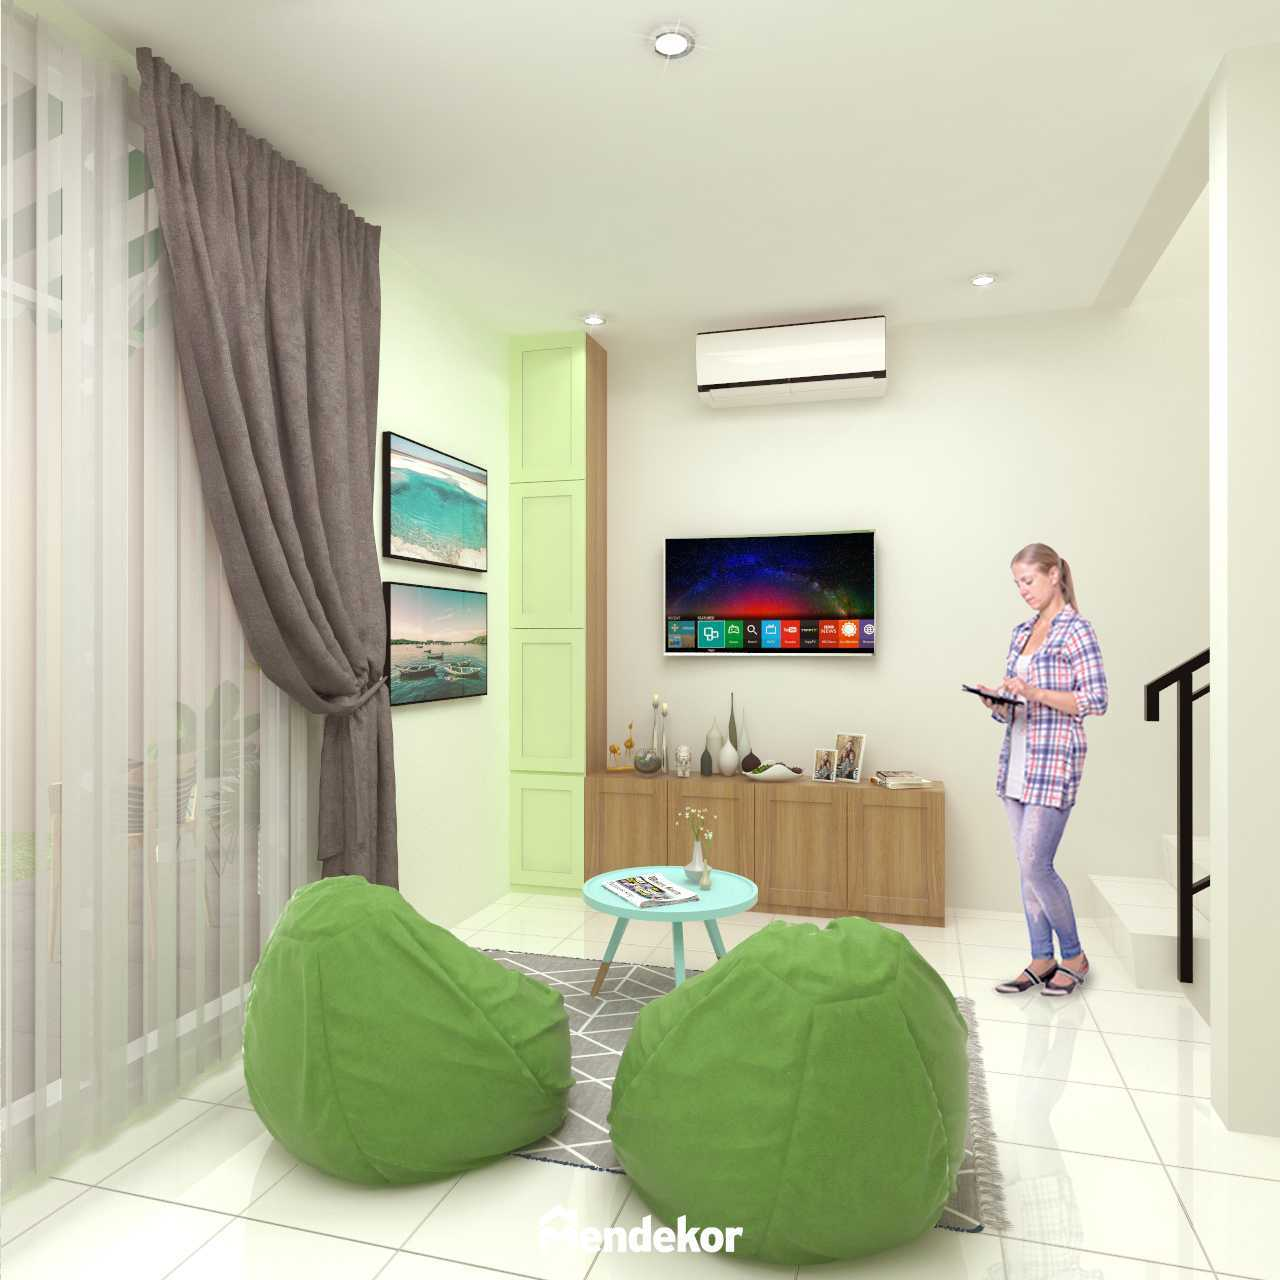 Mendekor Serang City Residence Serang, Kec. Serang, Kota Serang, Banten, Indonesia Serang, Kec. Serang, Kota Serang, Banten, Indonesia Living Room Minimalist  65094